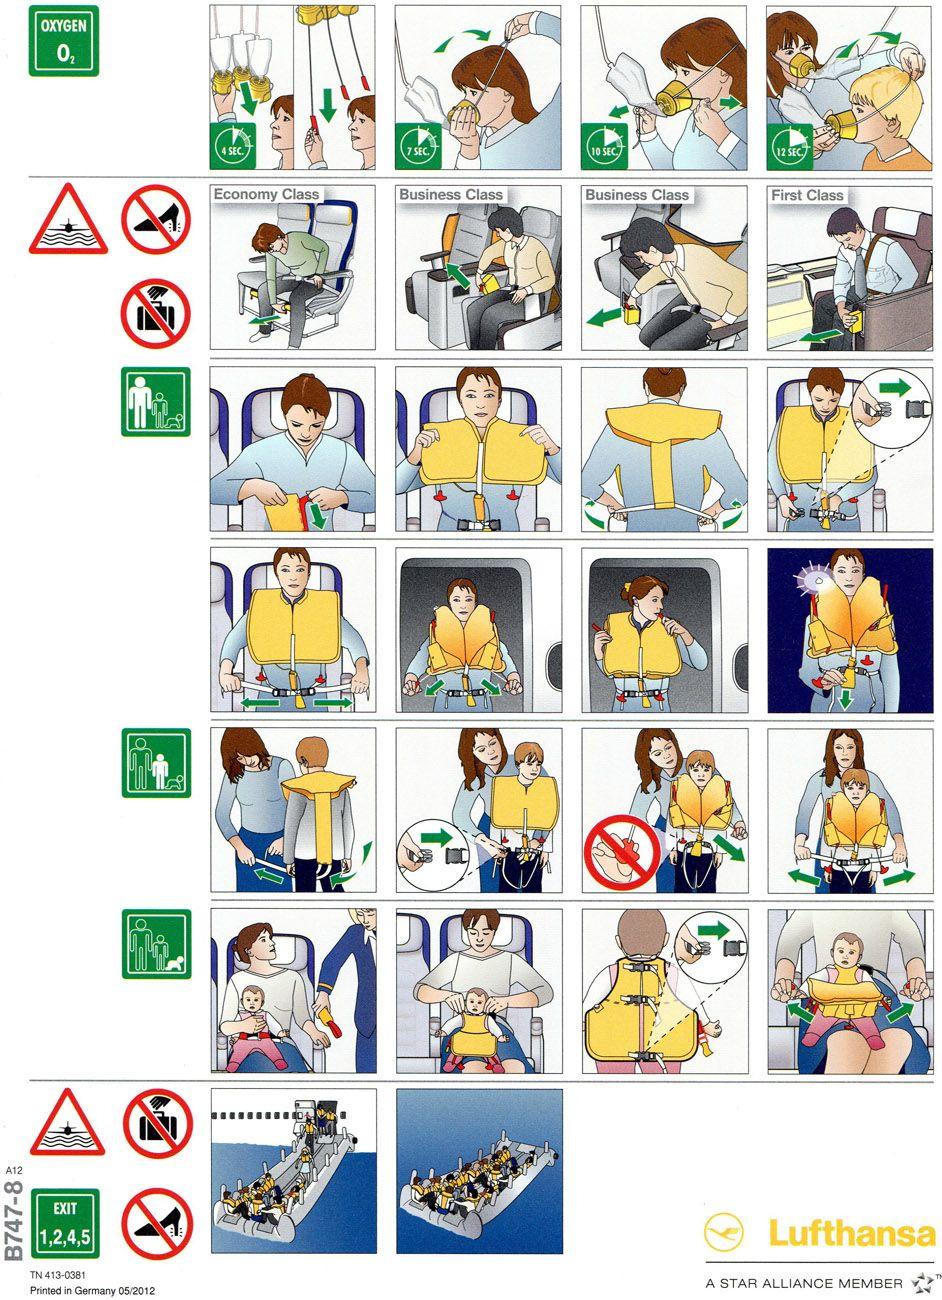 life jacket donning instruction poster